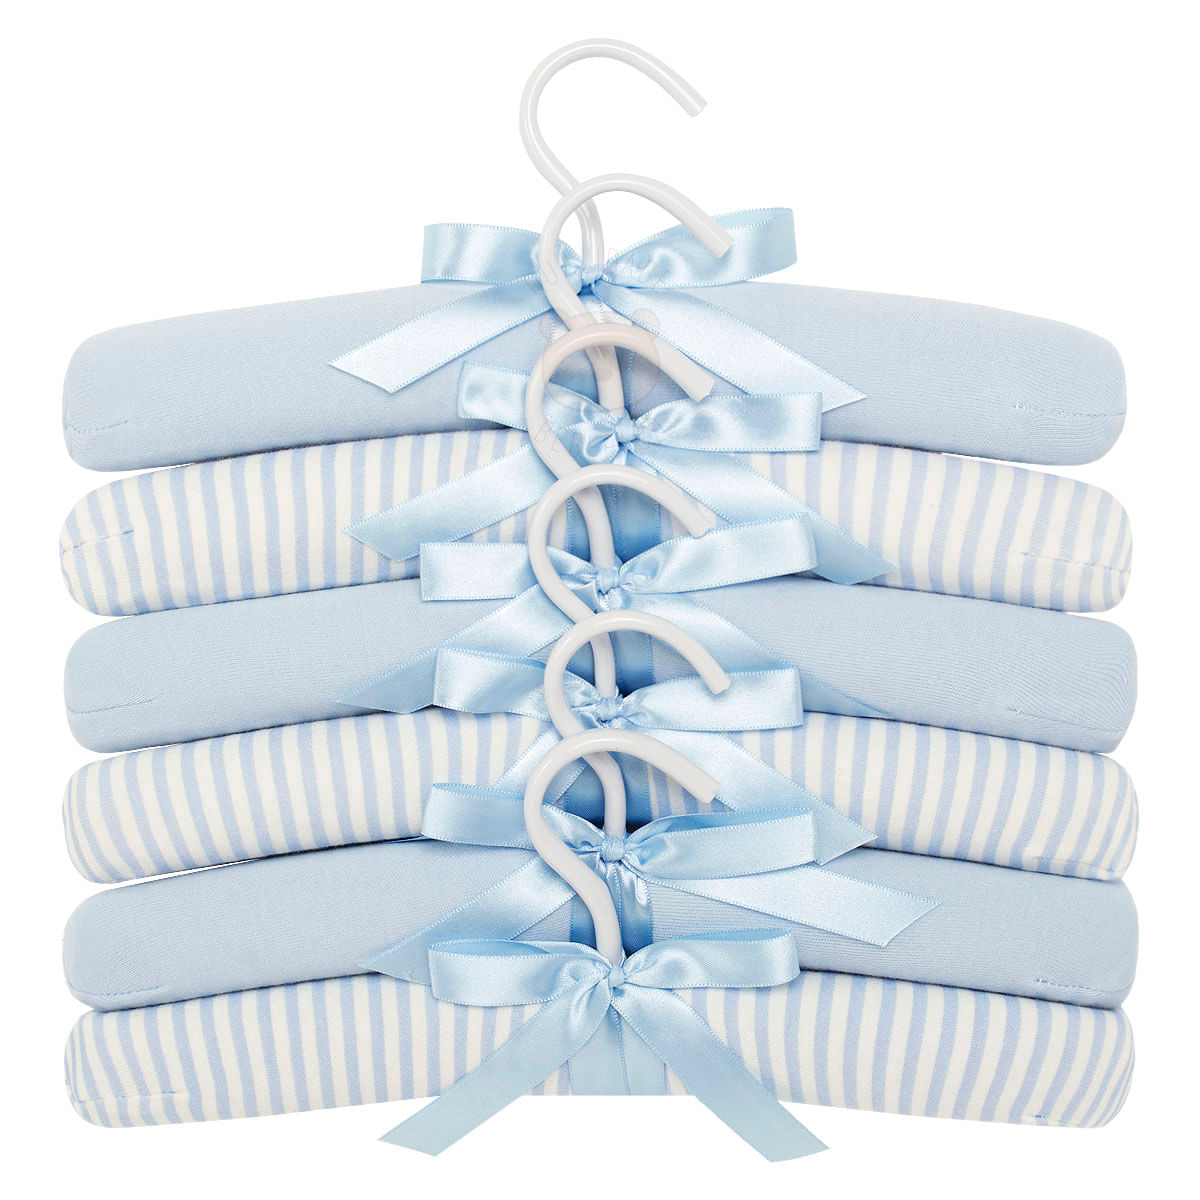 376a34cd56 Kit 6 Cabides em malha Little Dreamer Azul- Hug